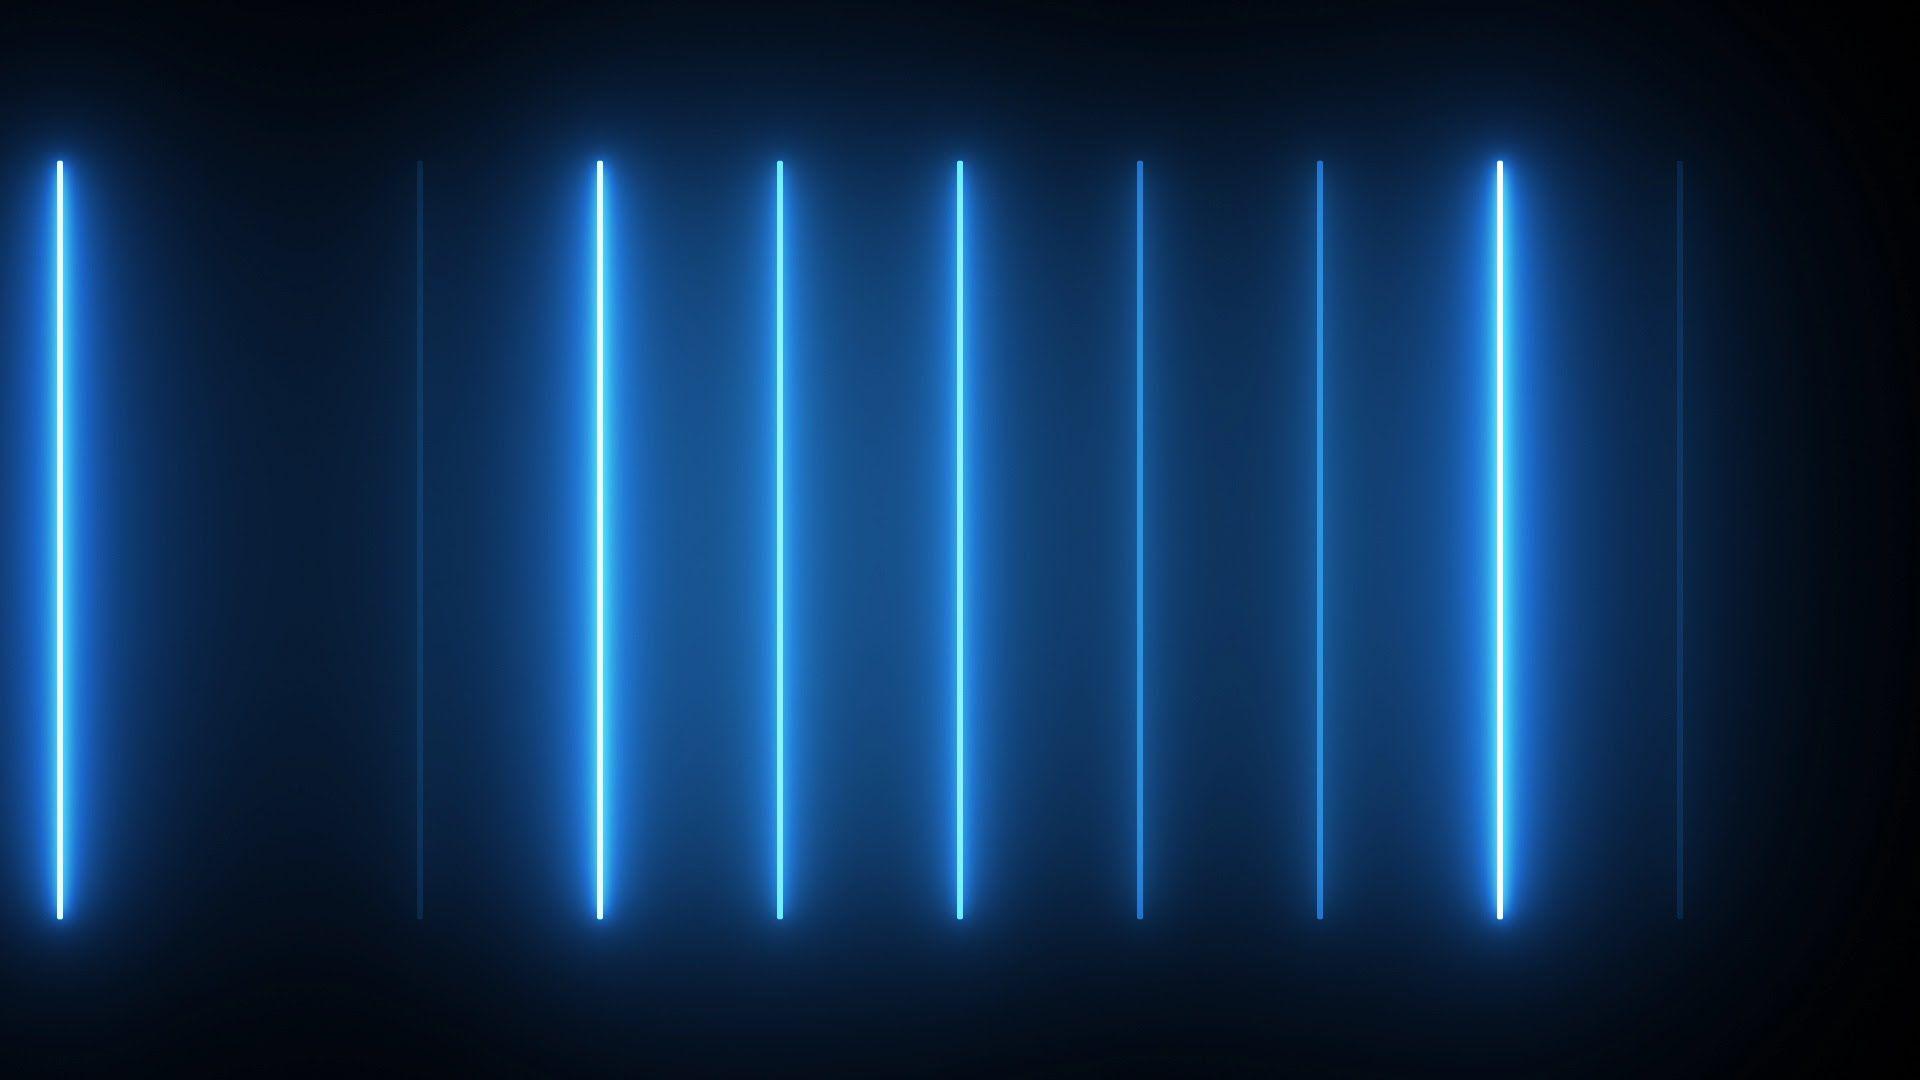 Electric blue neon neon wallpaper